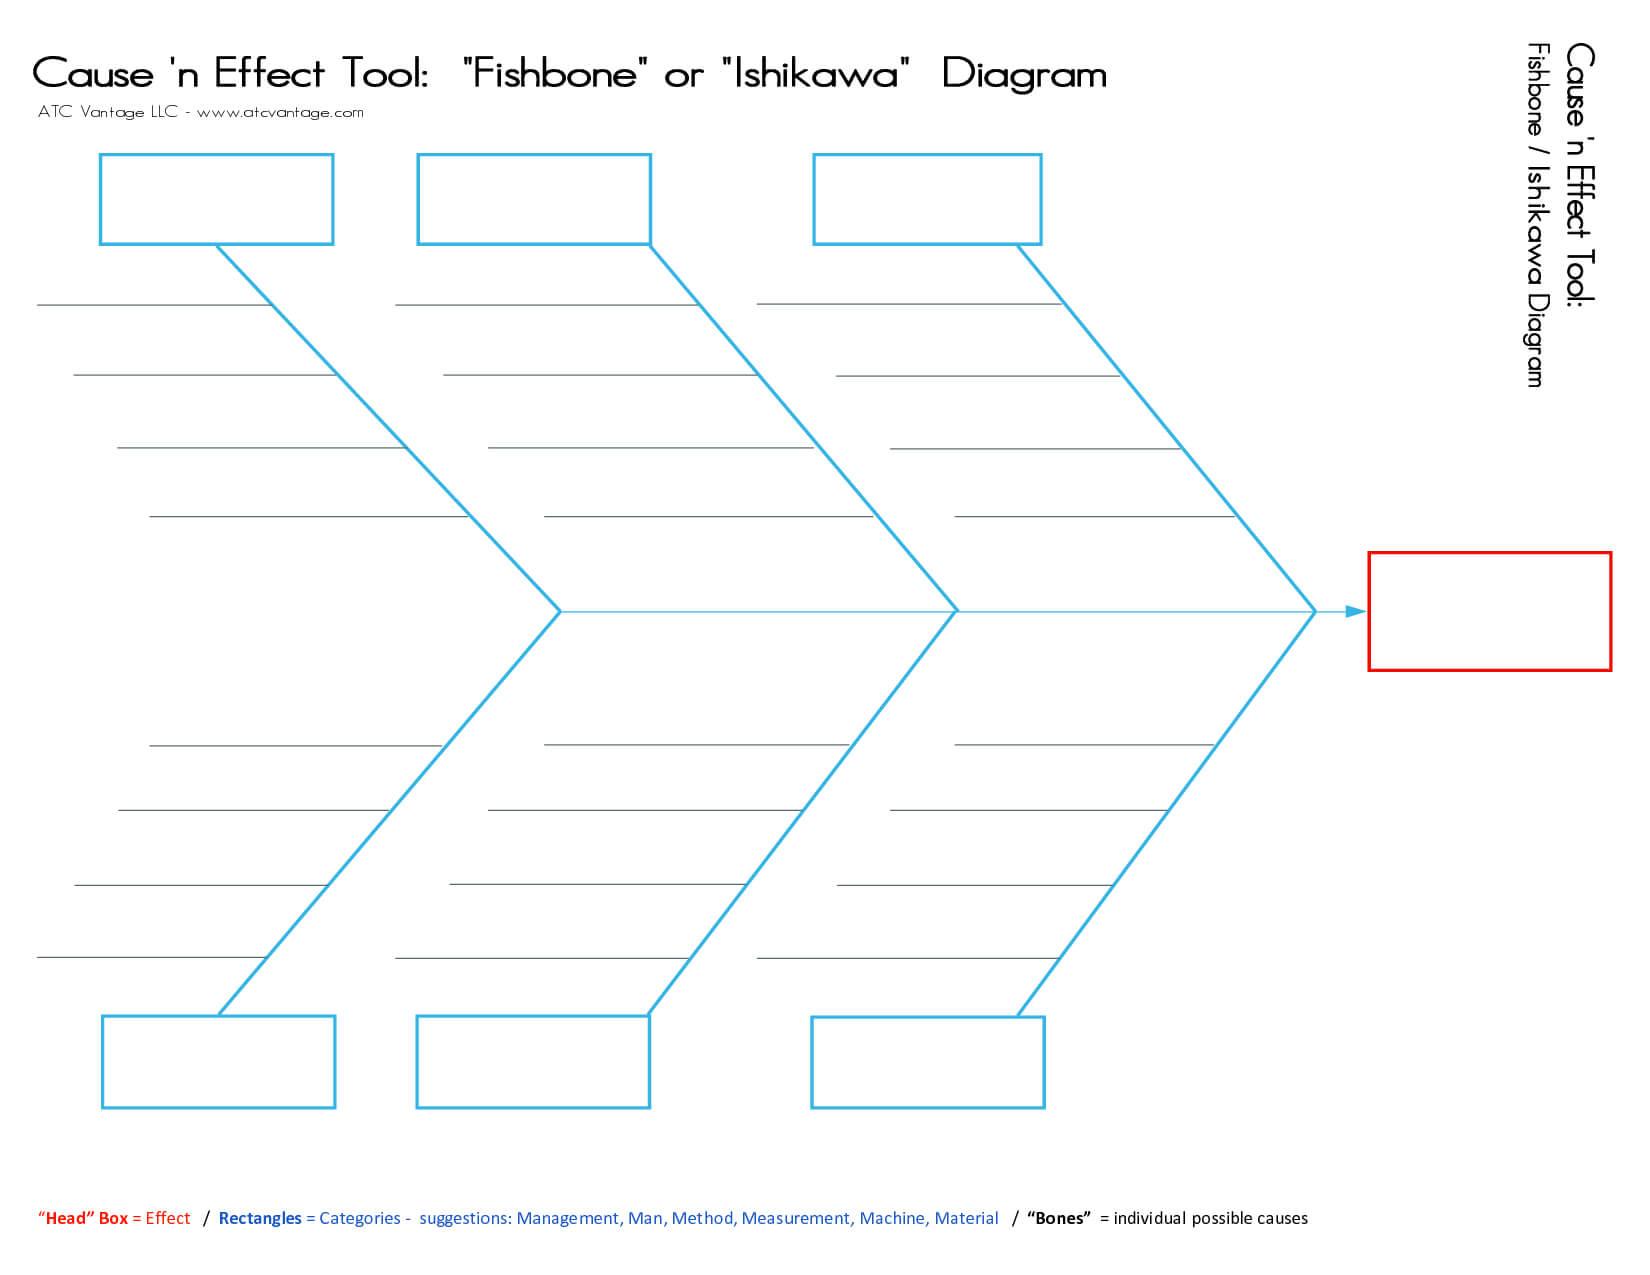 Fishbone Template. 15 Authorized Fishbone Diagram Templates Intended For Blank Fishbone Diagram Template Word